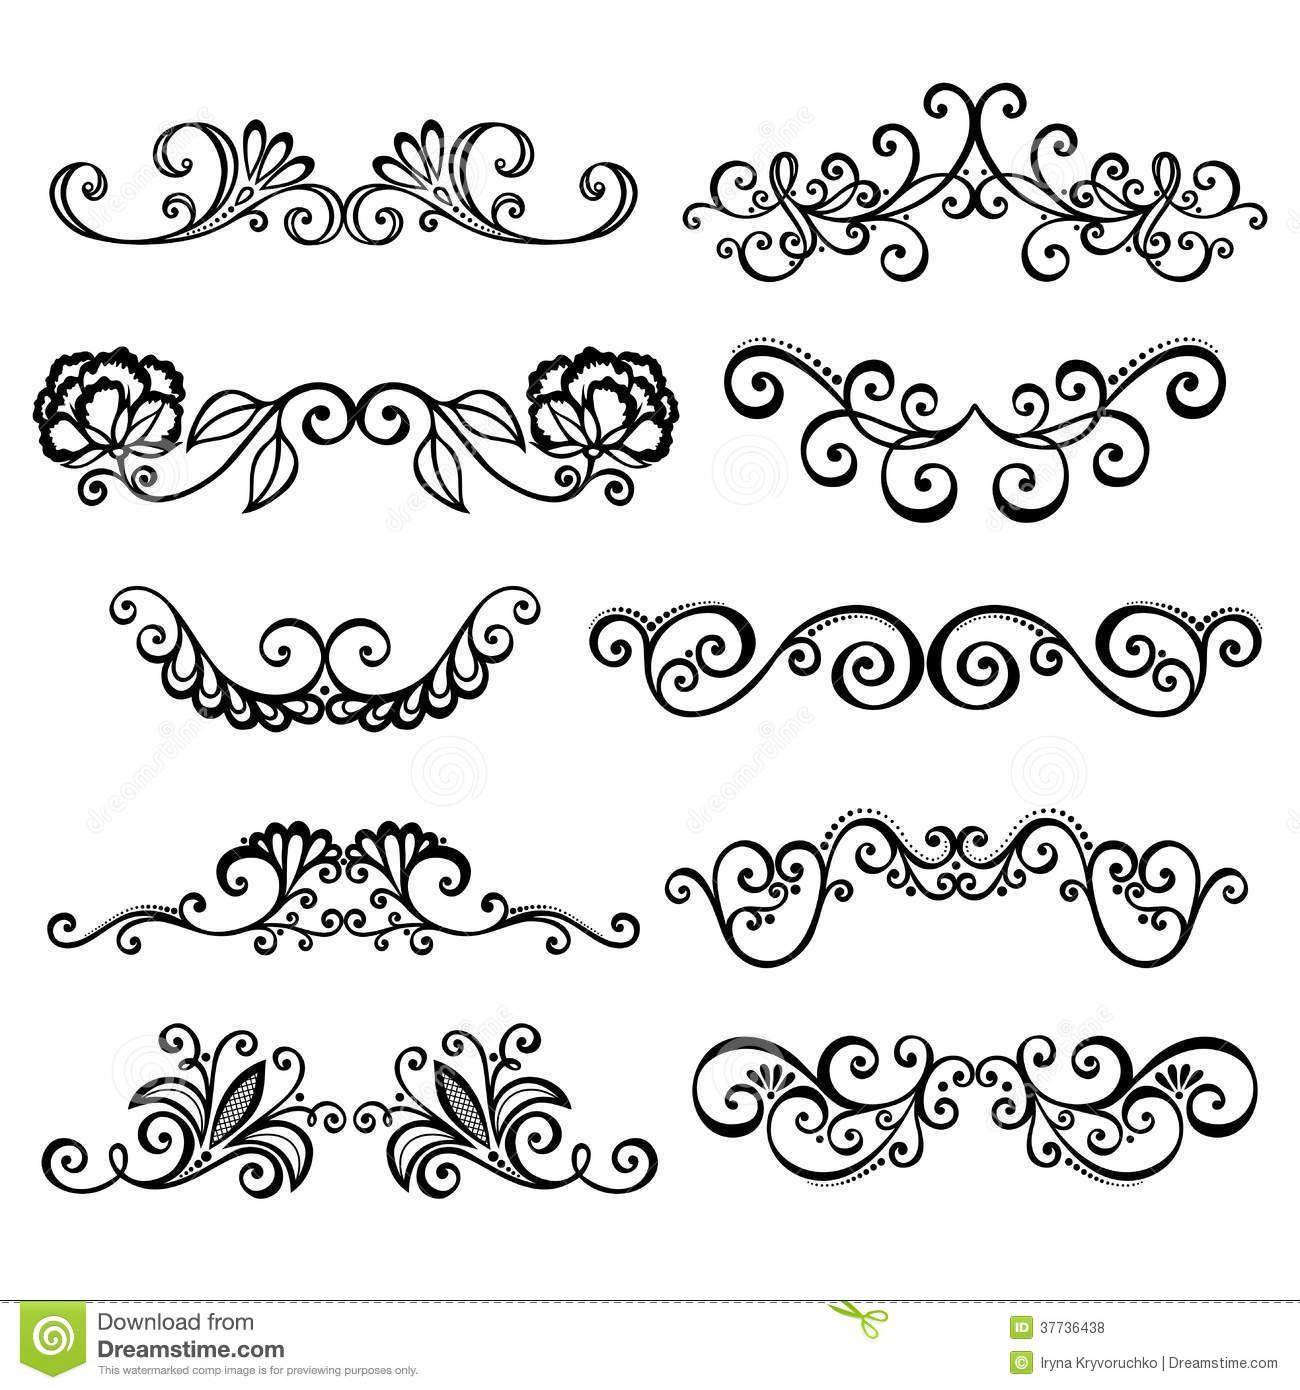 1300 X 1390 198 KB Jpeg Calligraphy Borders Free